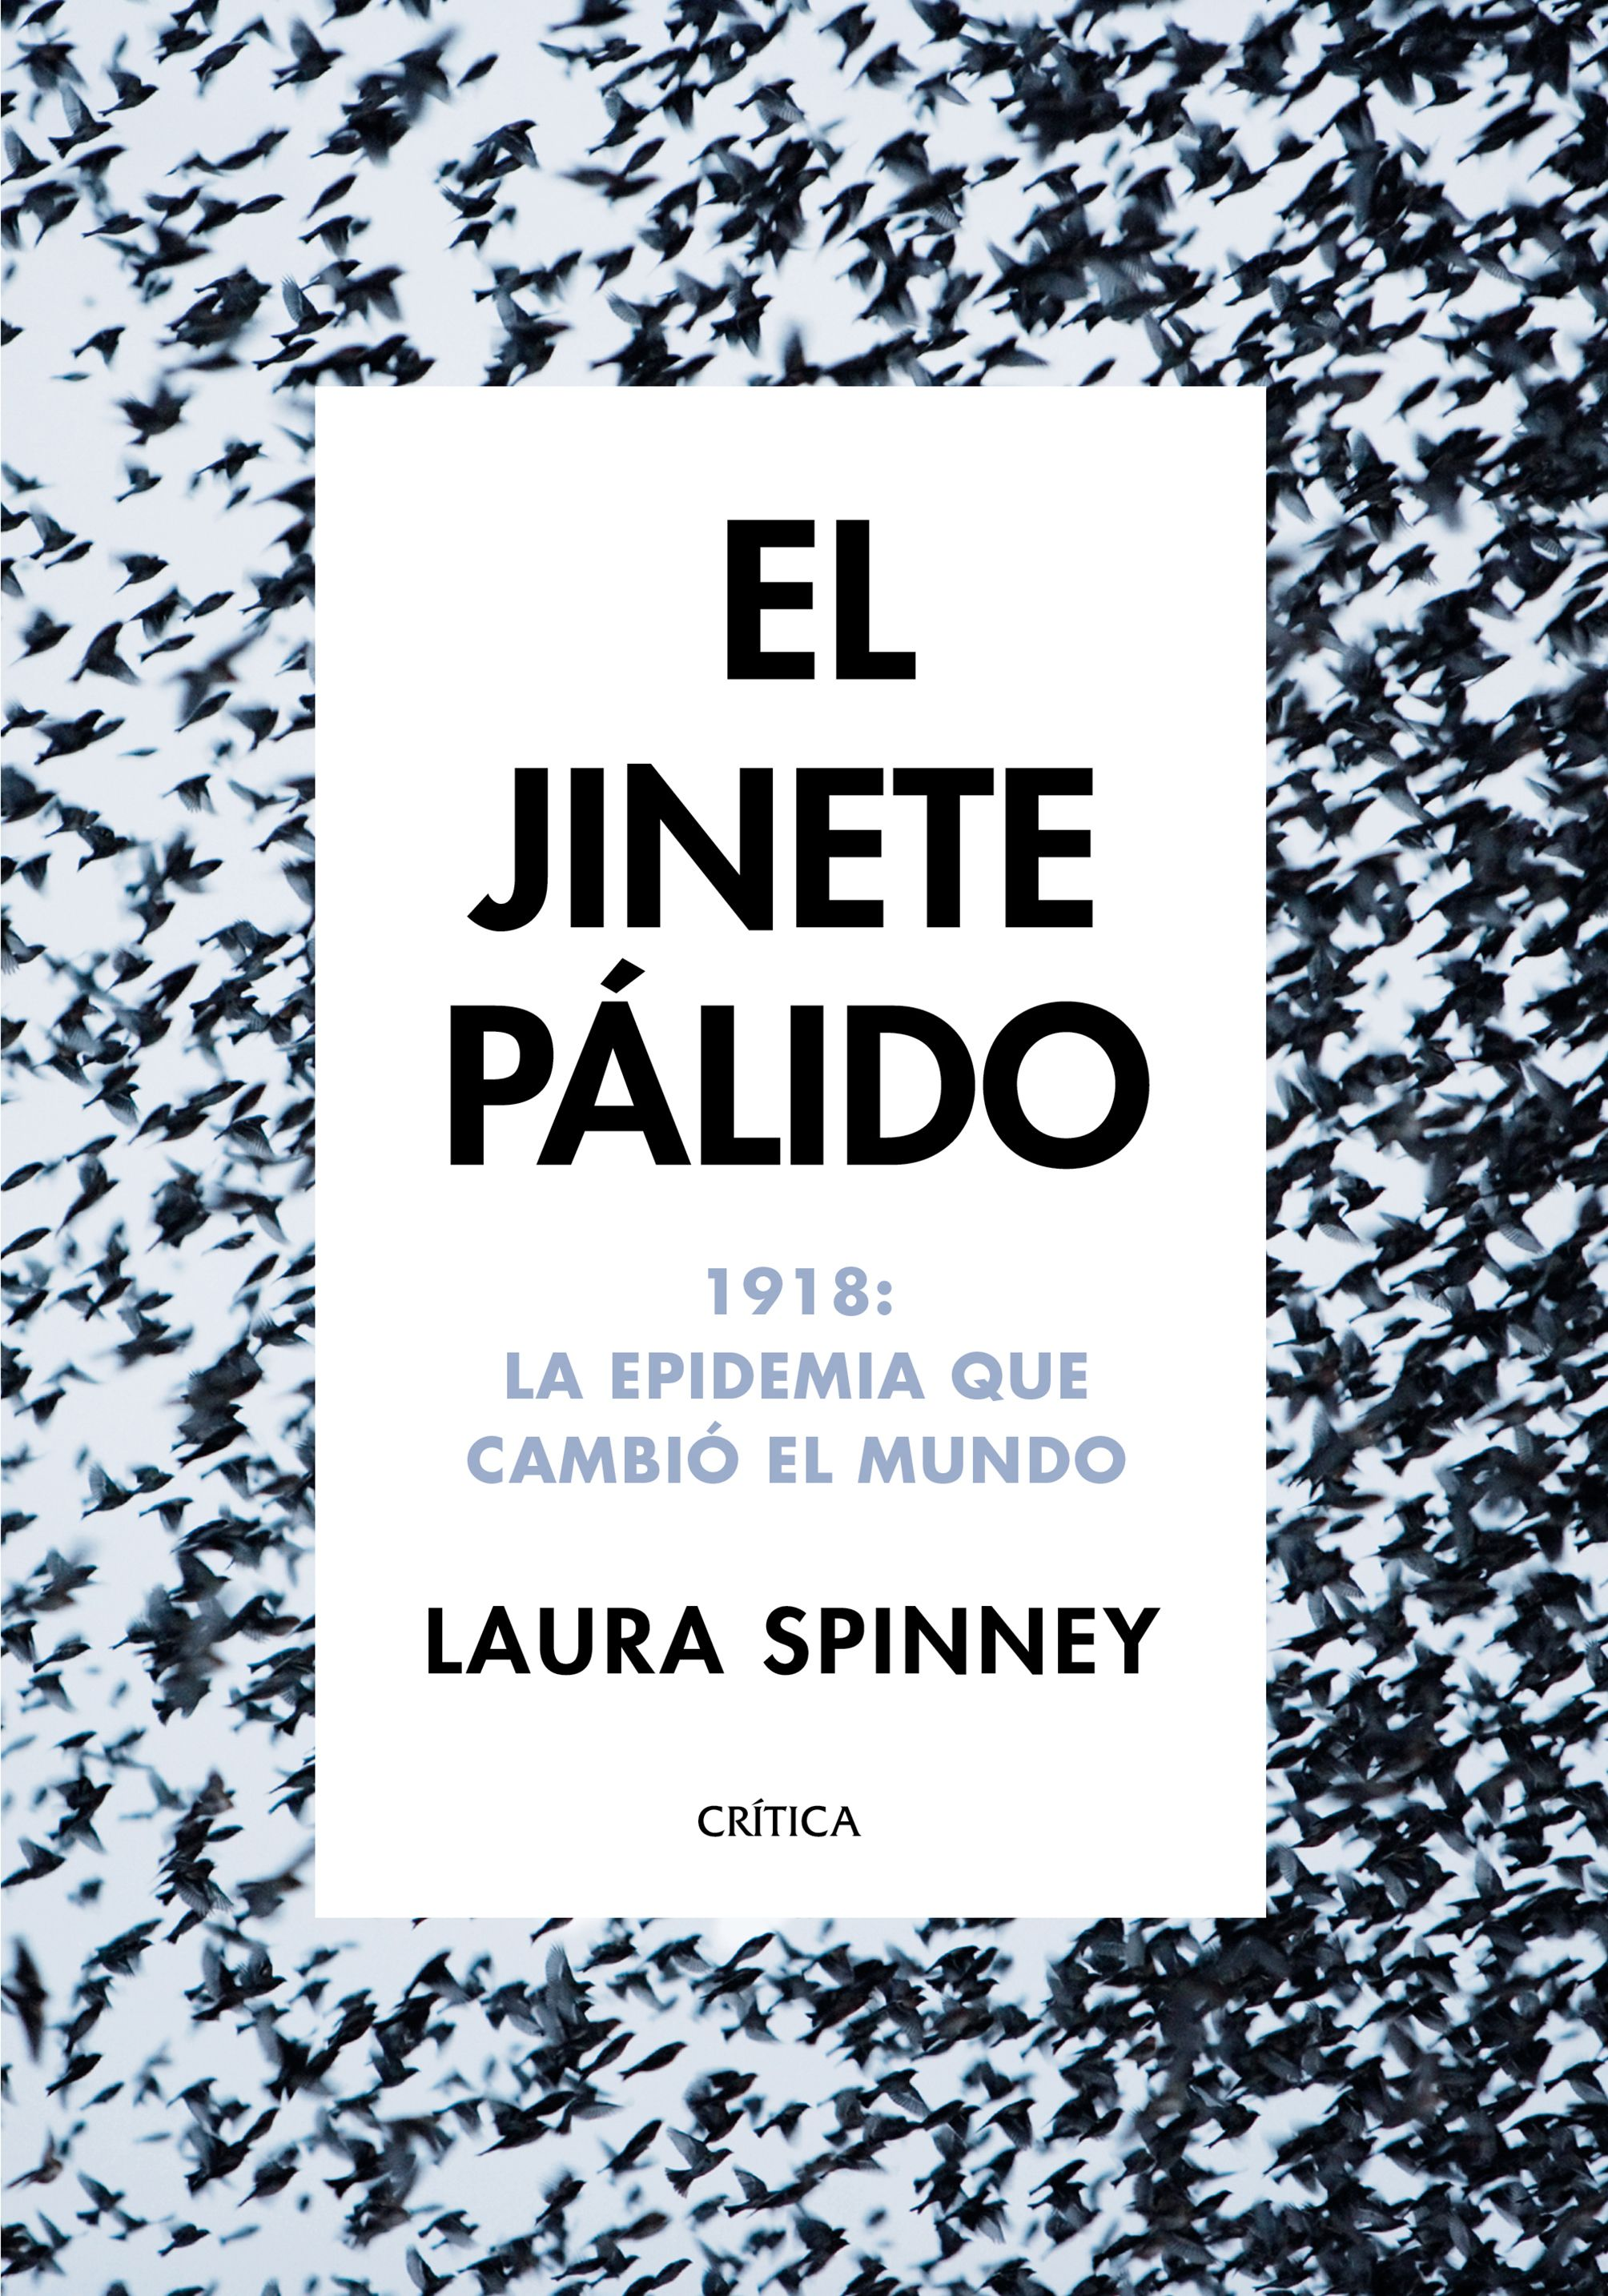 EL JINETE PALIDO de Laura Spinney